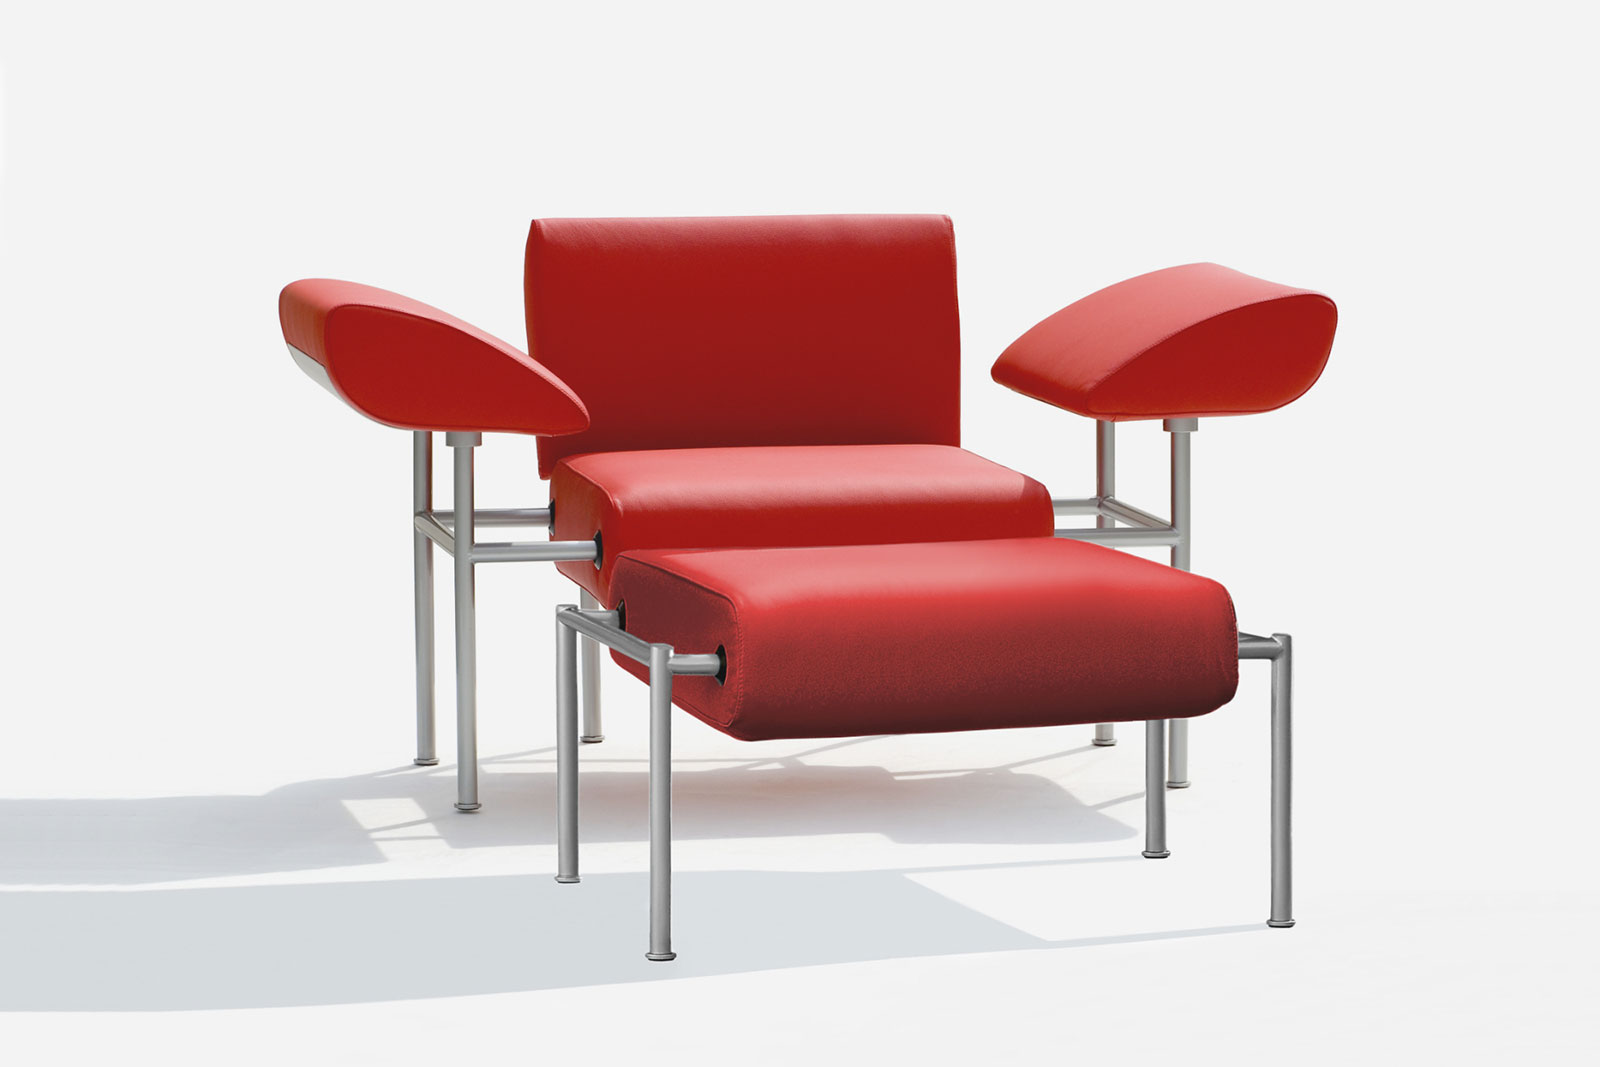 Spelt poltrona armchair fauteuil poggiapiedi footrest repose pied 1